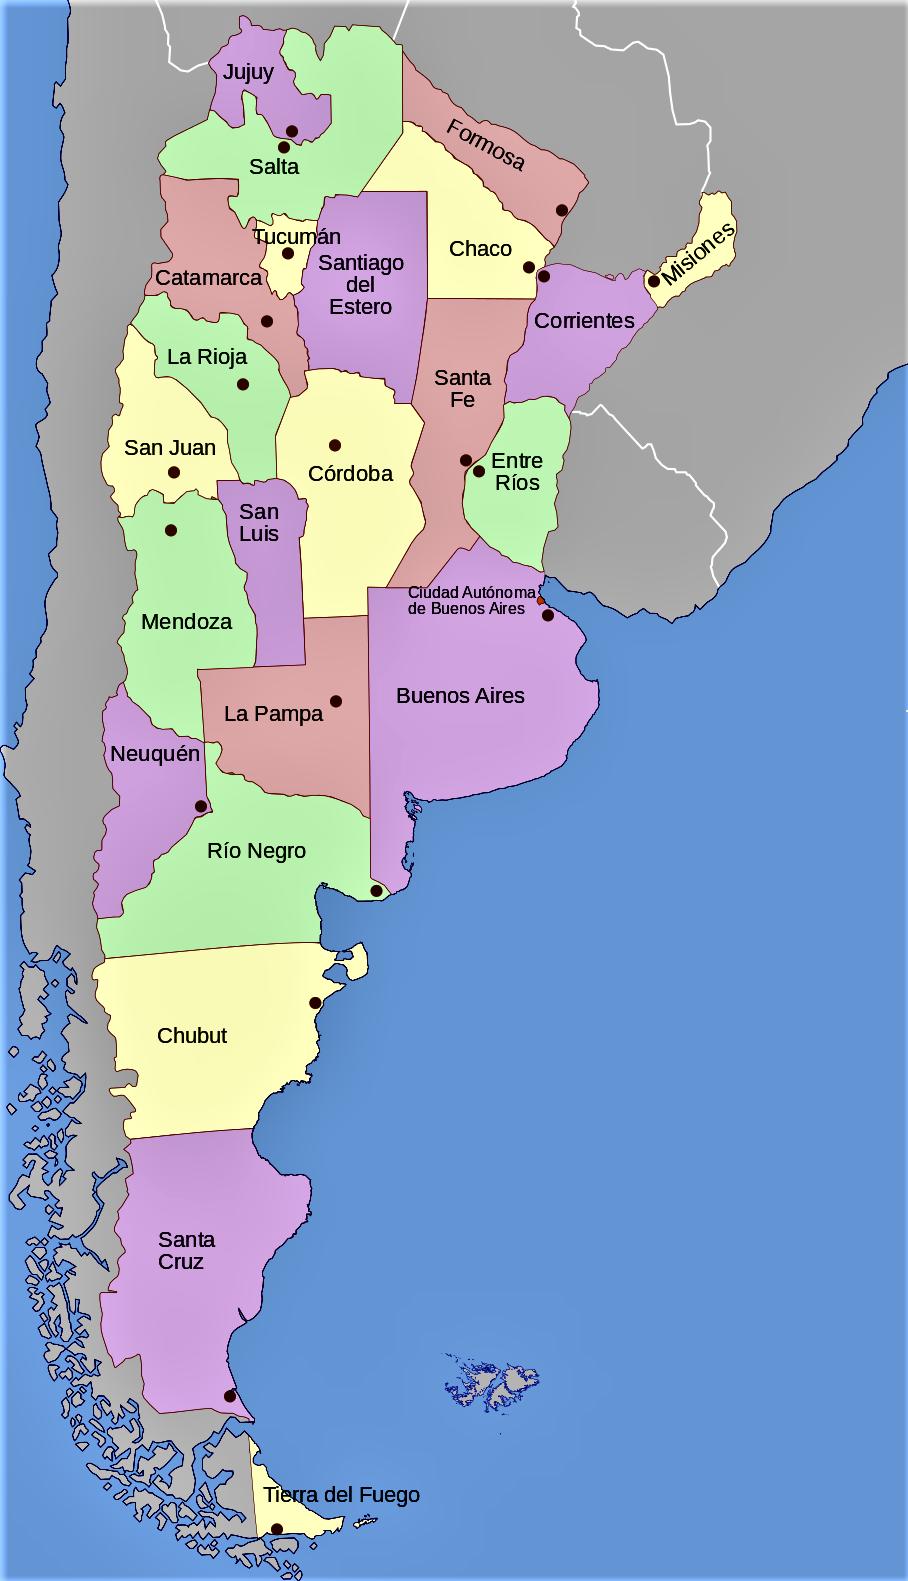 Mapa Argentina Politico Con Nombres Mapa De Argentina Mapa Politico Mapa Fisico